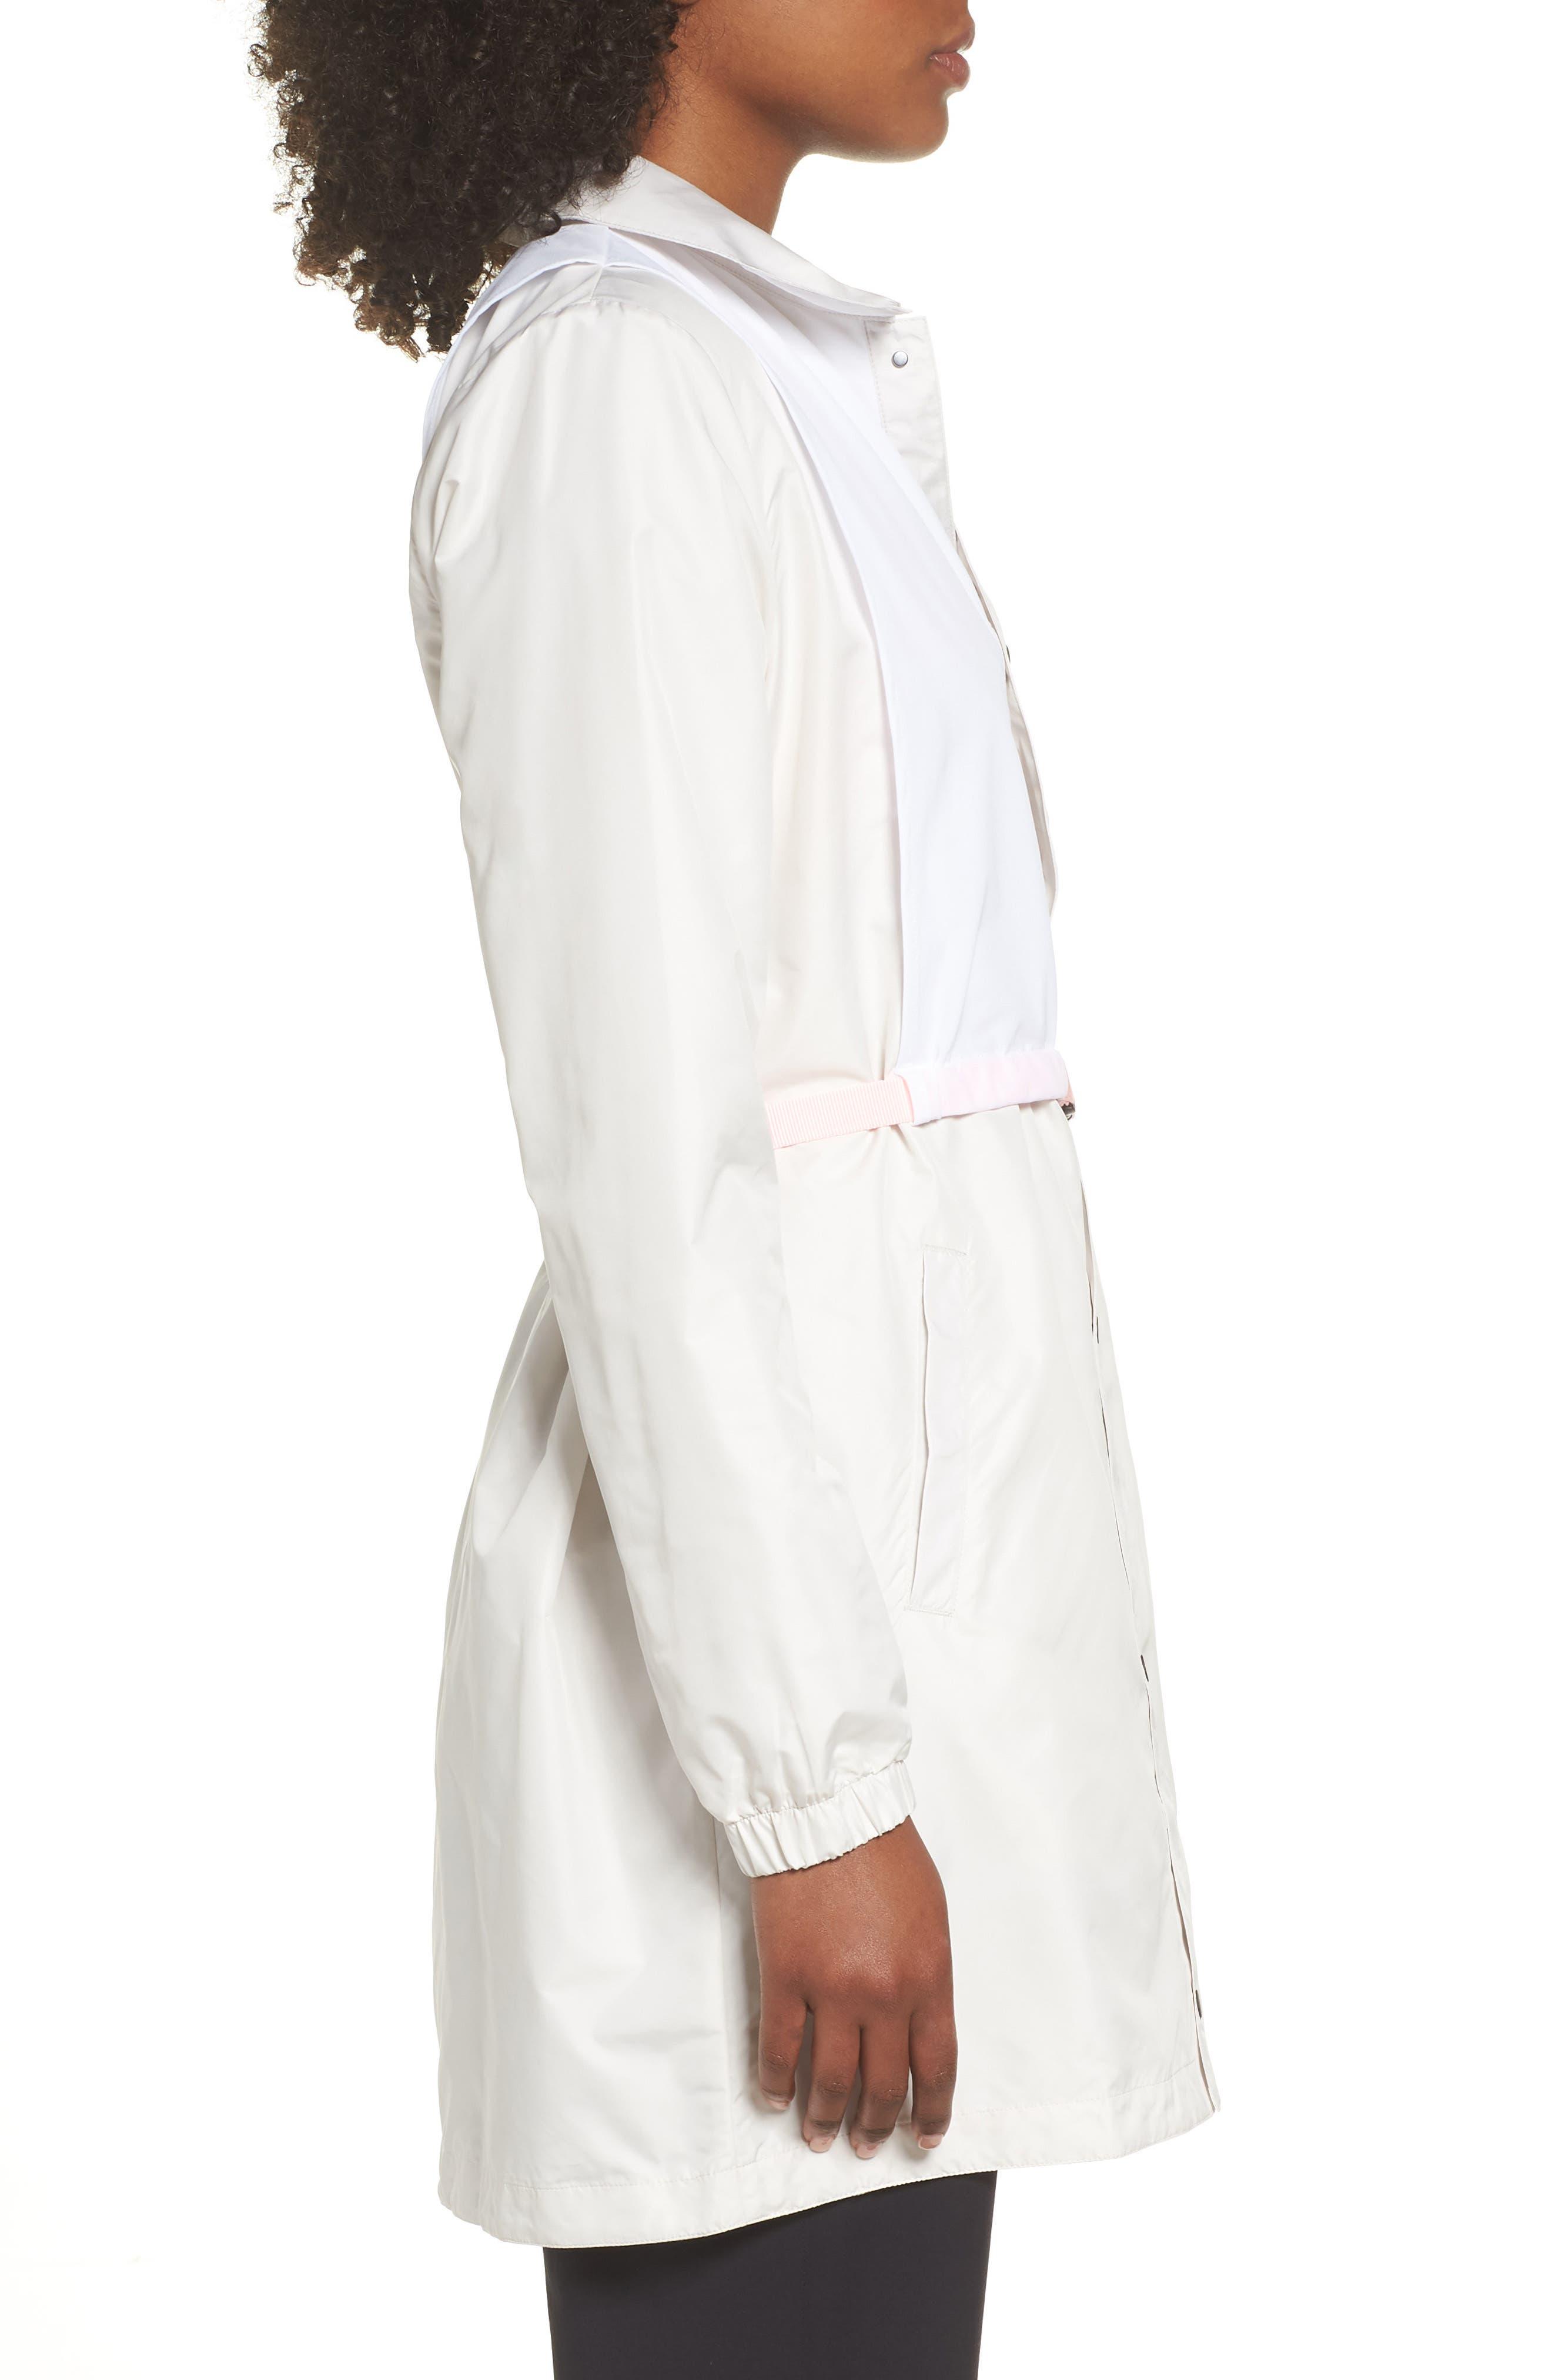 Hybrid Coaches Jacket/Dress,                             Alternate thumbnail 3, color,                             PHANTOM/ WHITE/ ARCTIC PUNCH